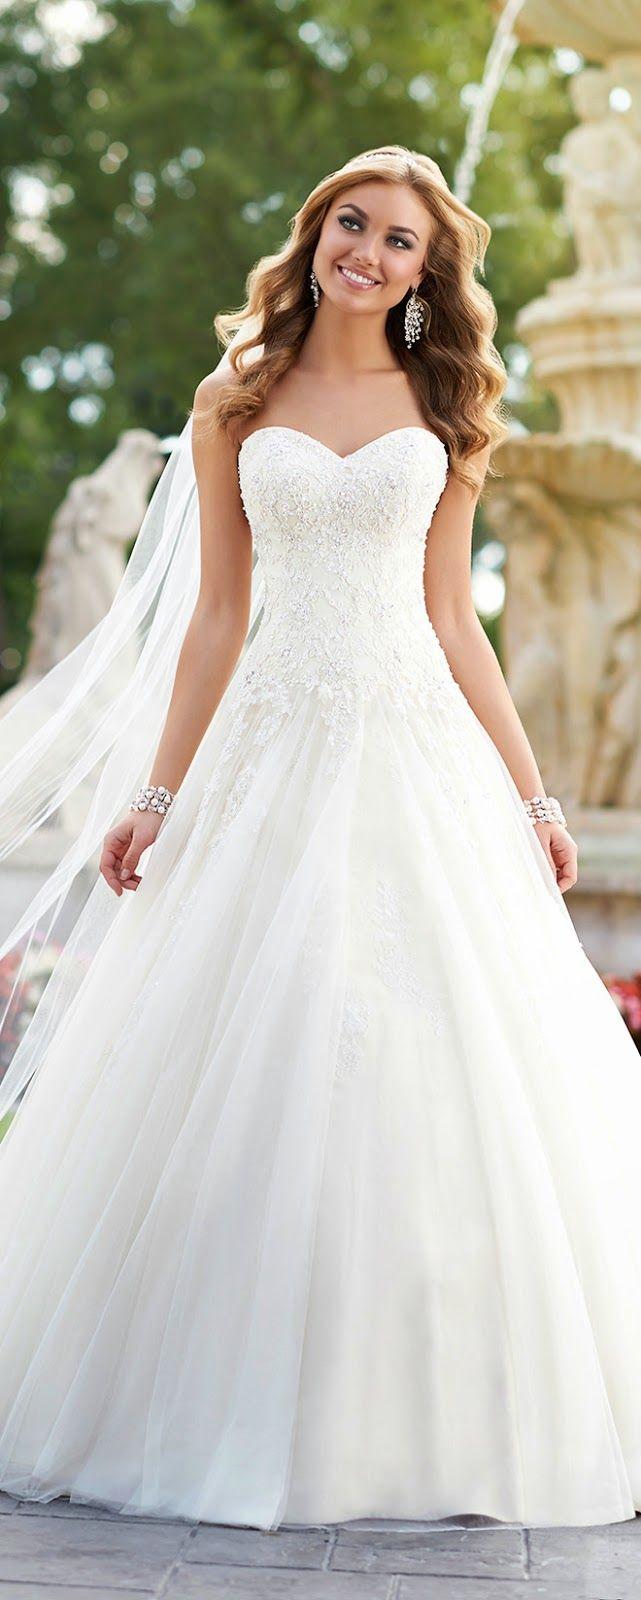 perfect wedding dress Stella York Fall Bridal Collection Weding DressesBest Wedding